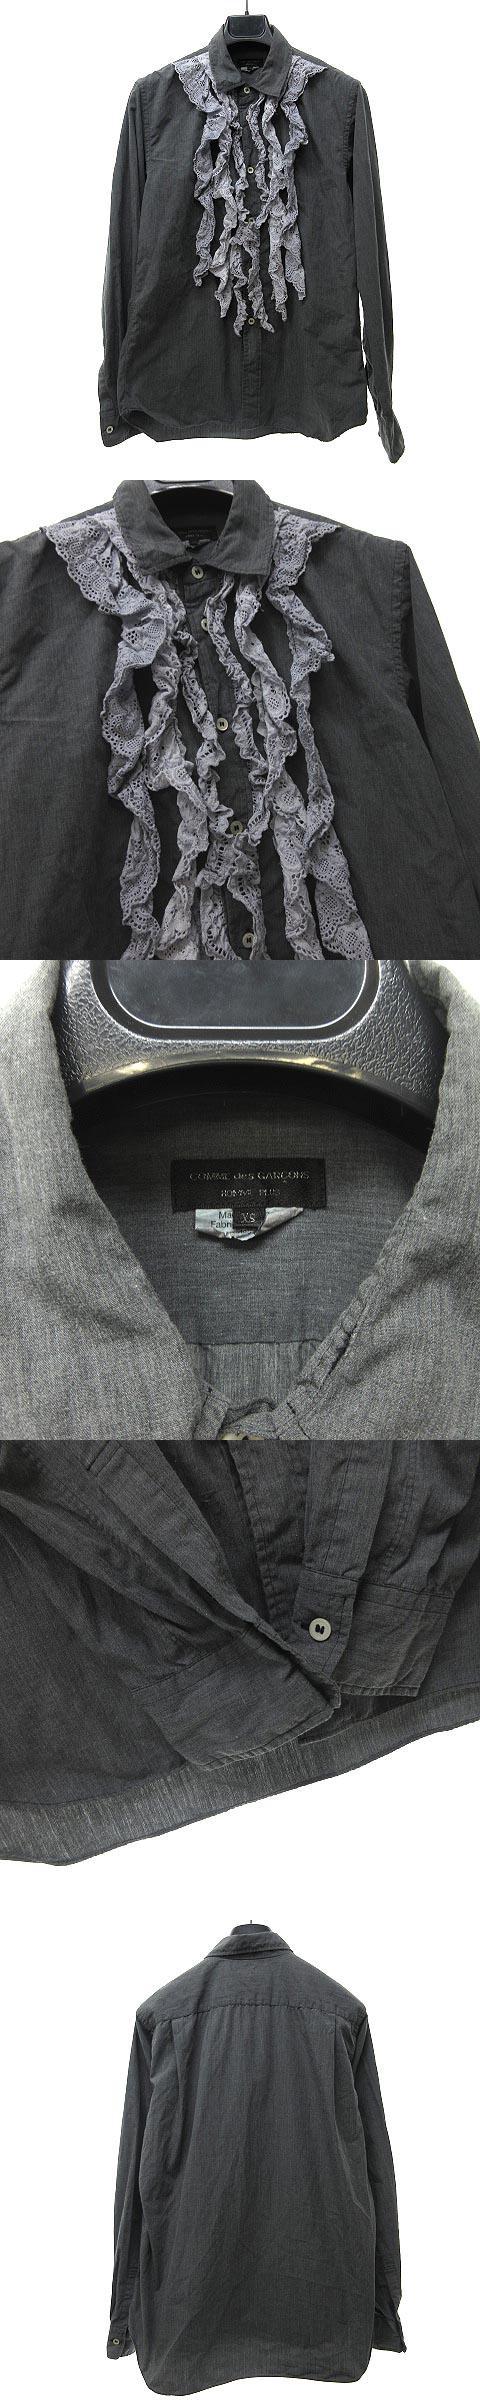 14SS 孵化期 レース フリル シャツ 長袖 グレー XS 0225